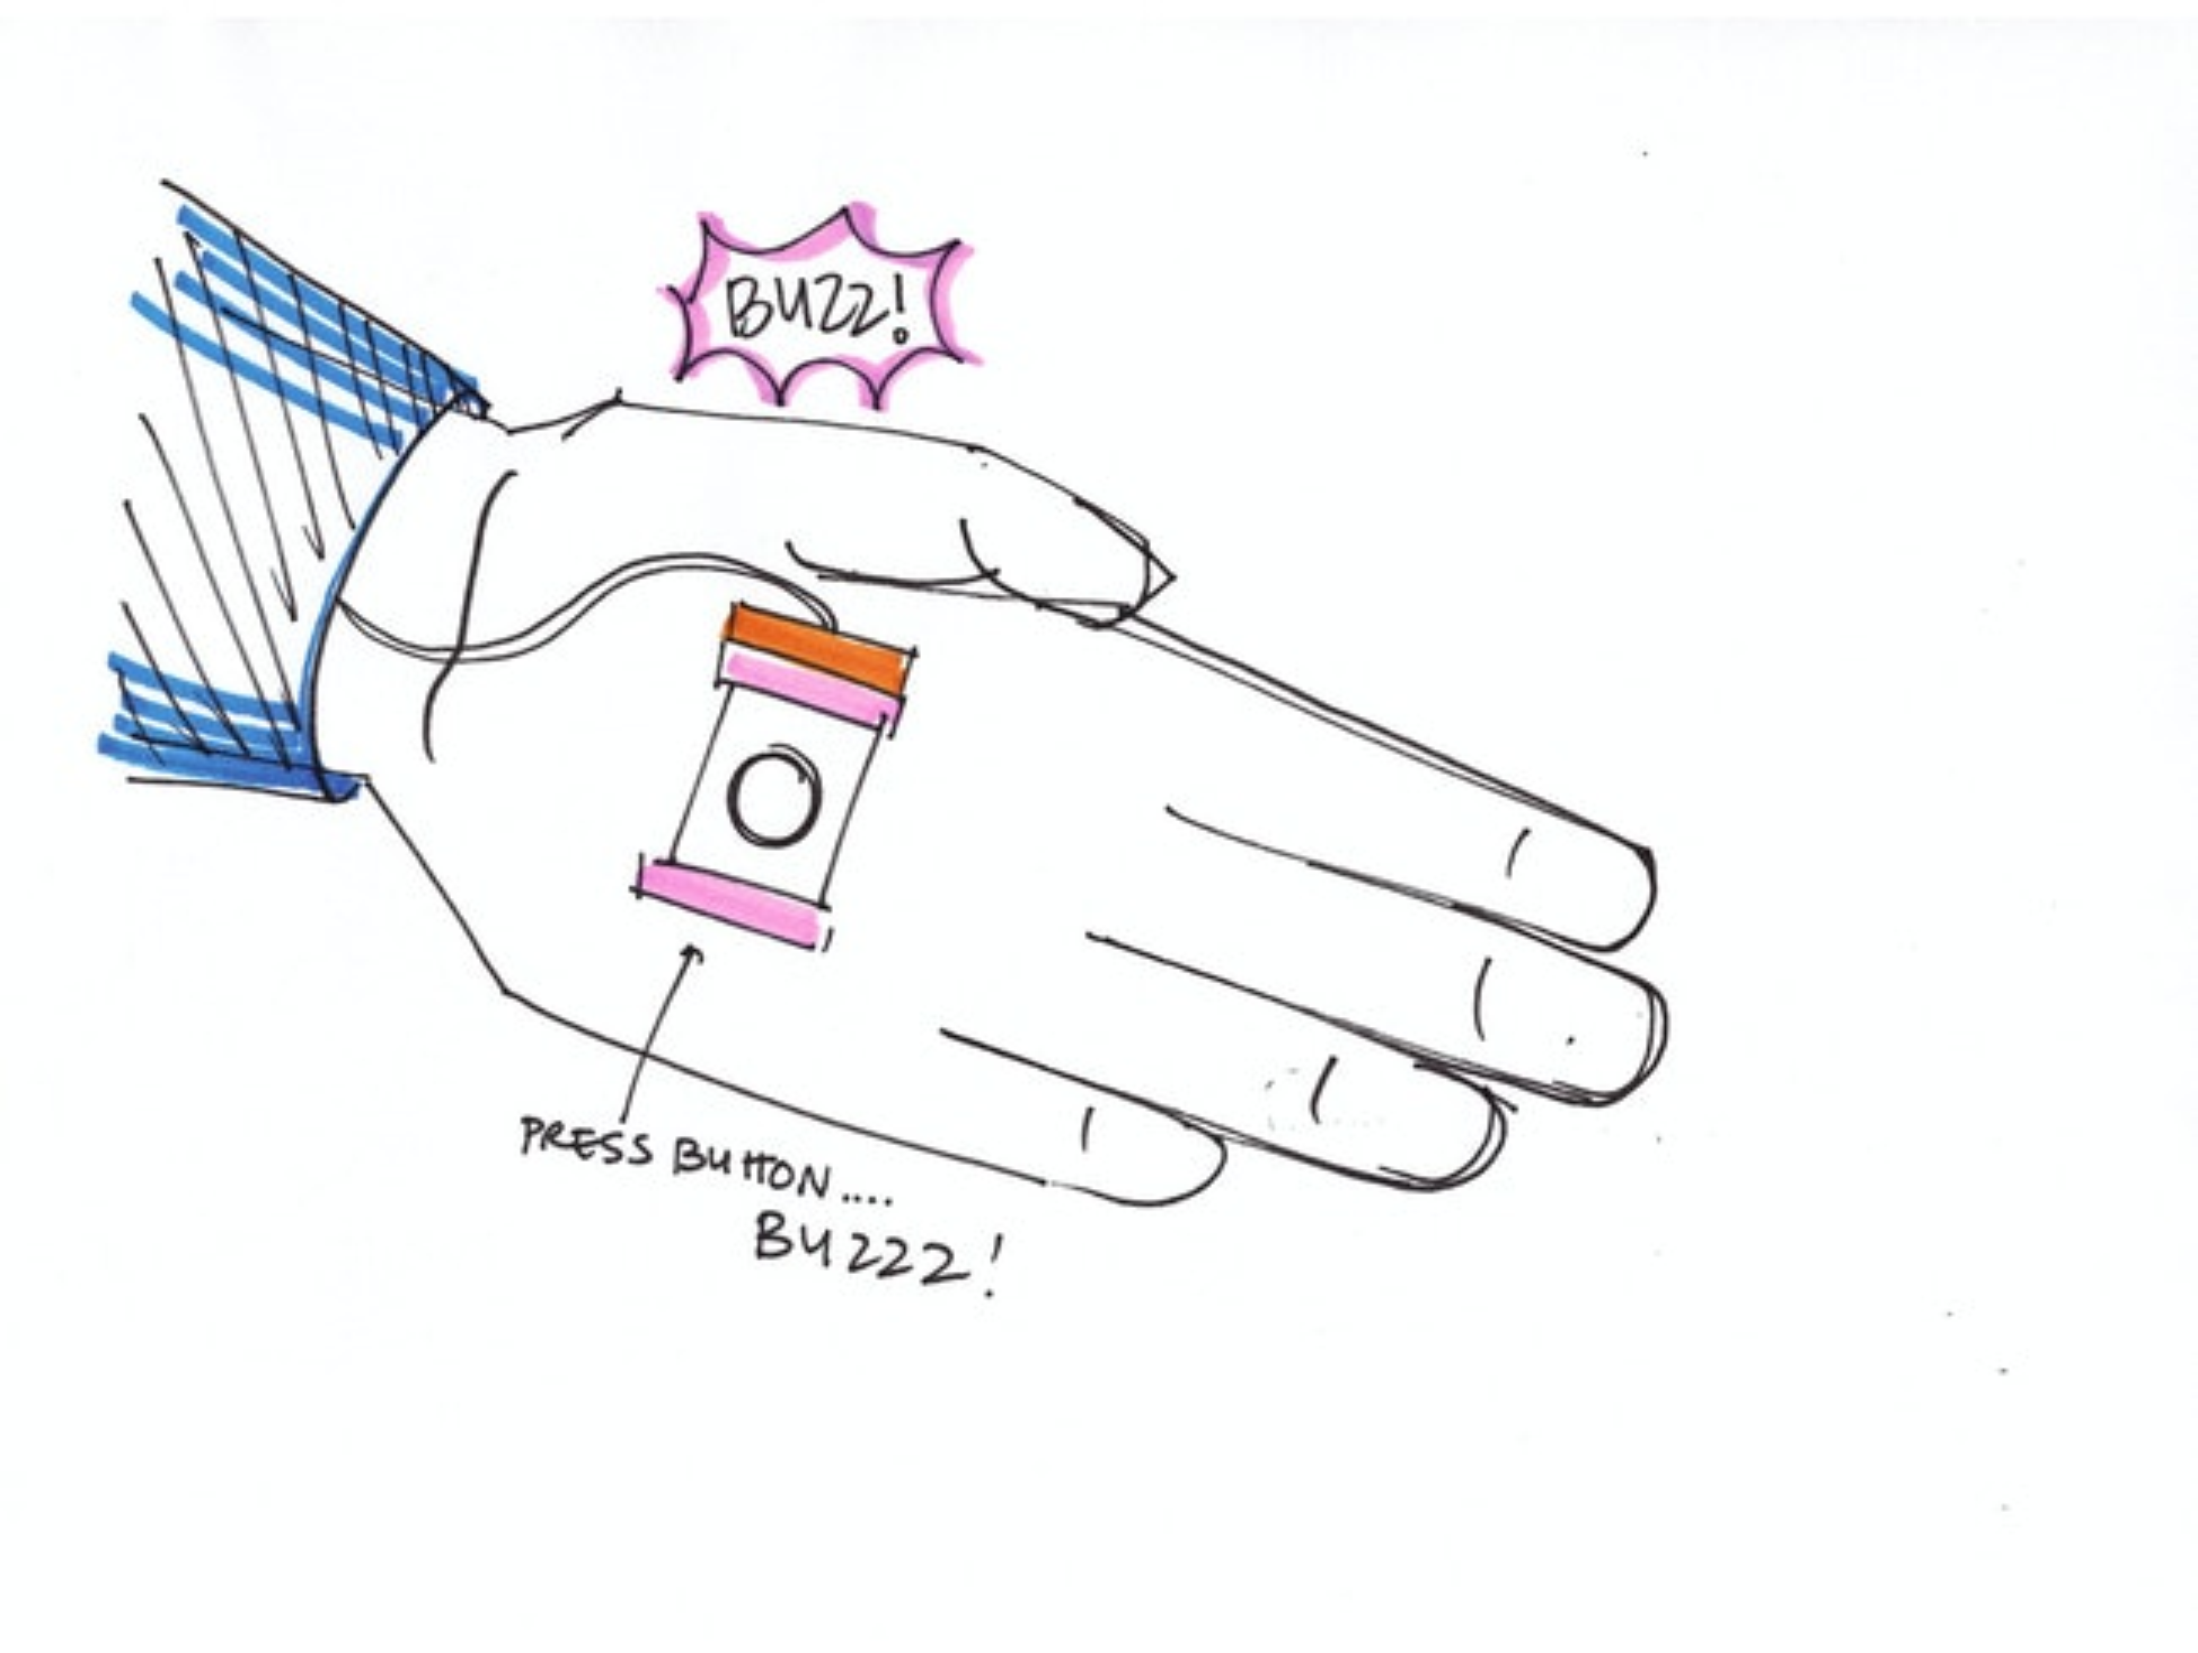 Prank handshake